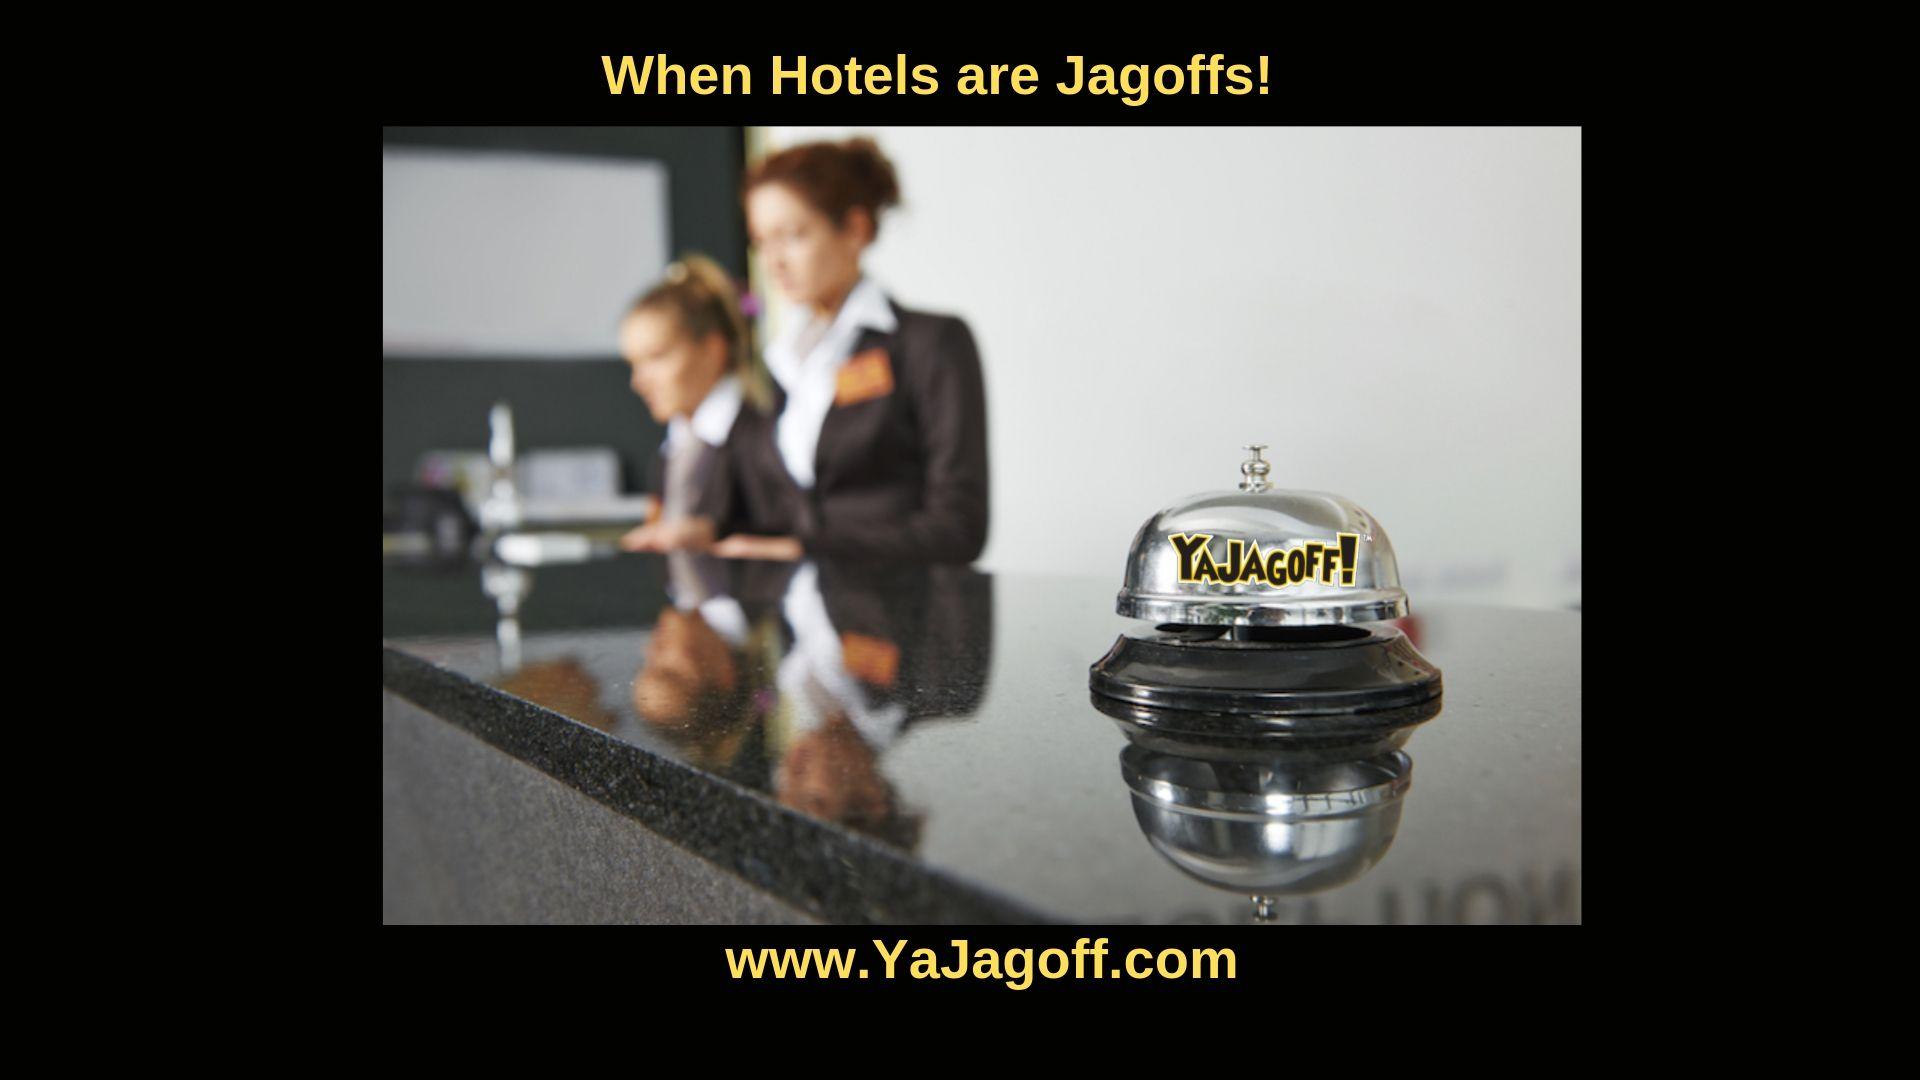 YaJagoff Hotels